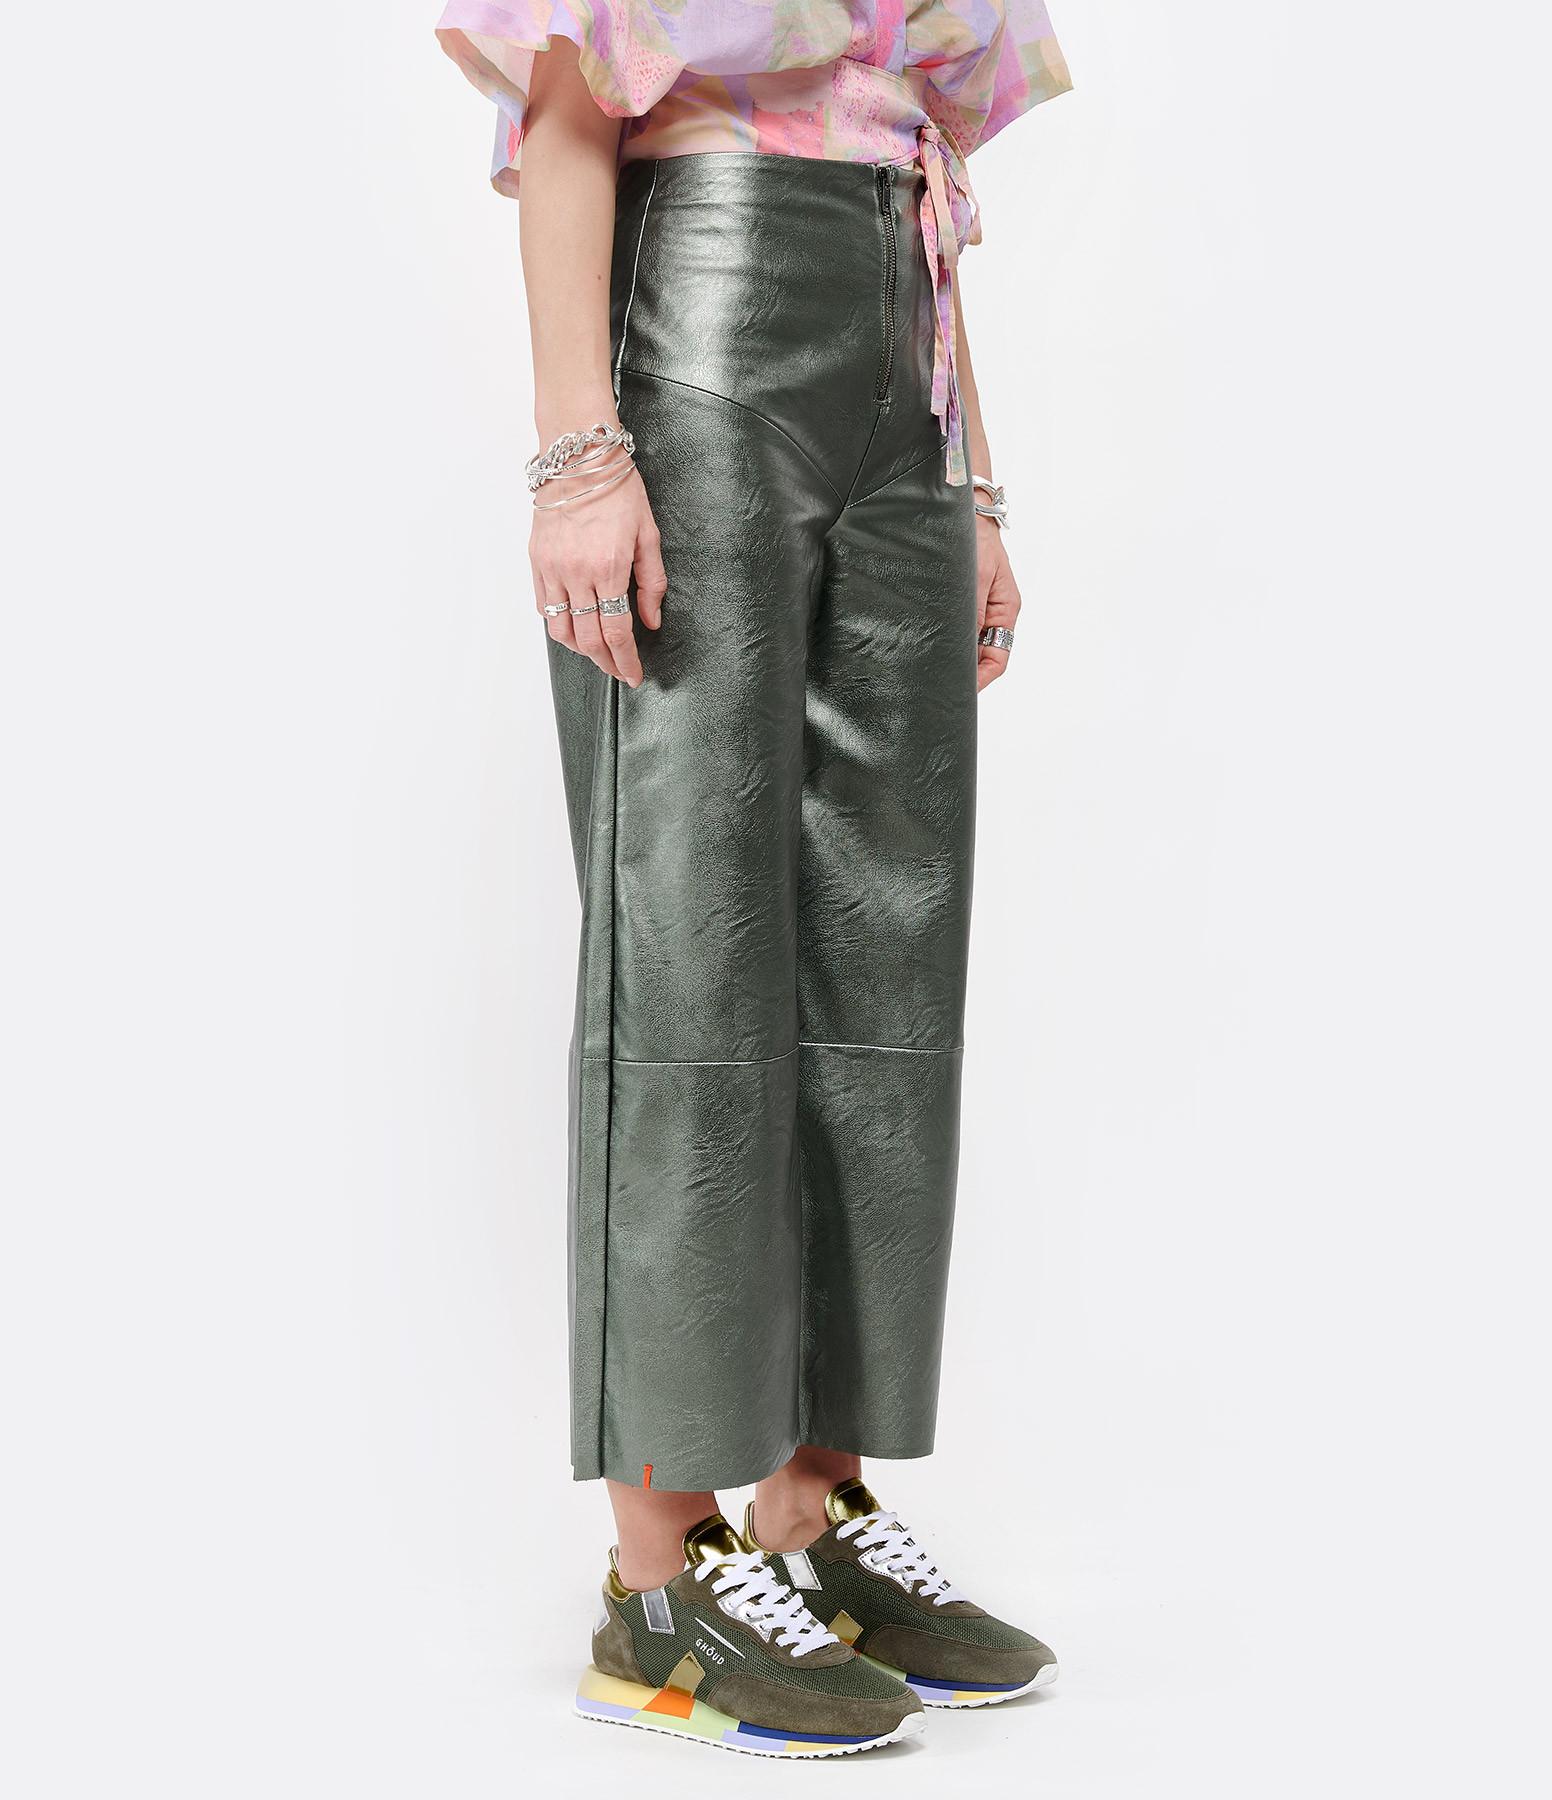 MAEVY - Pantalon India Kaki